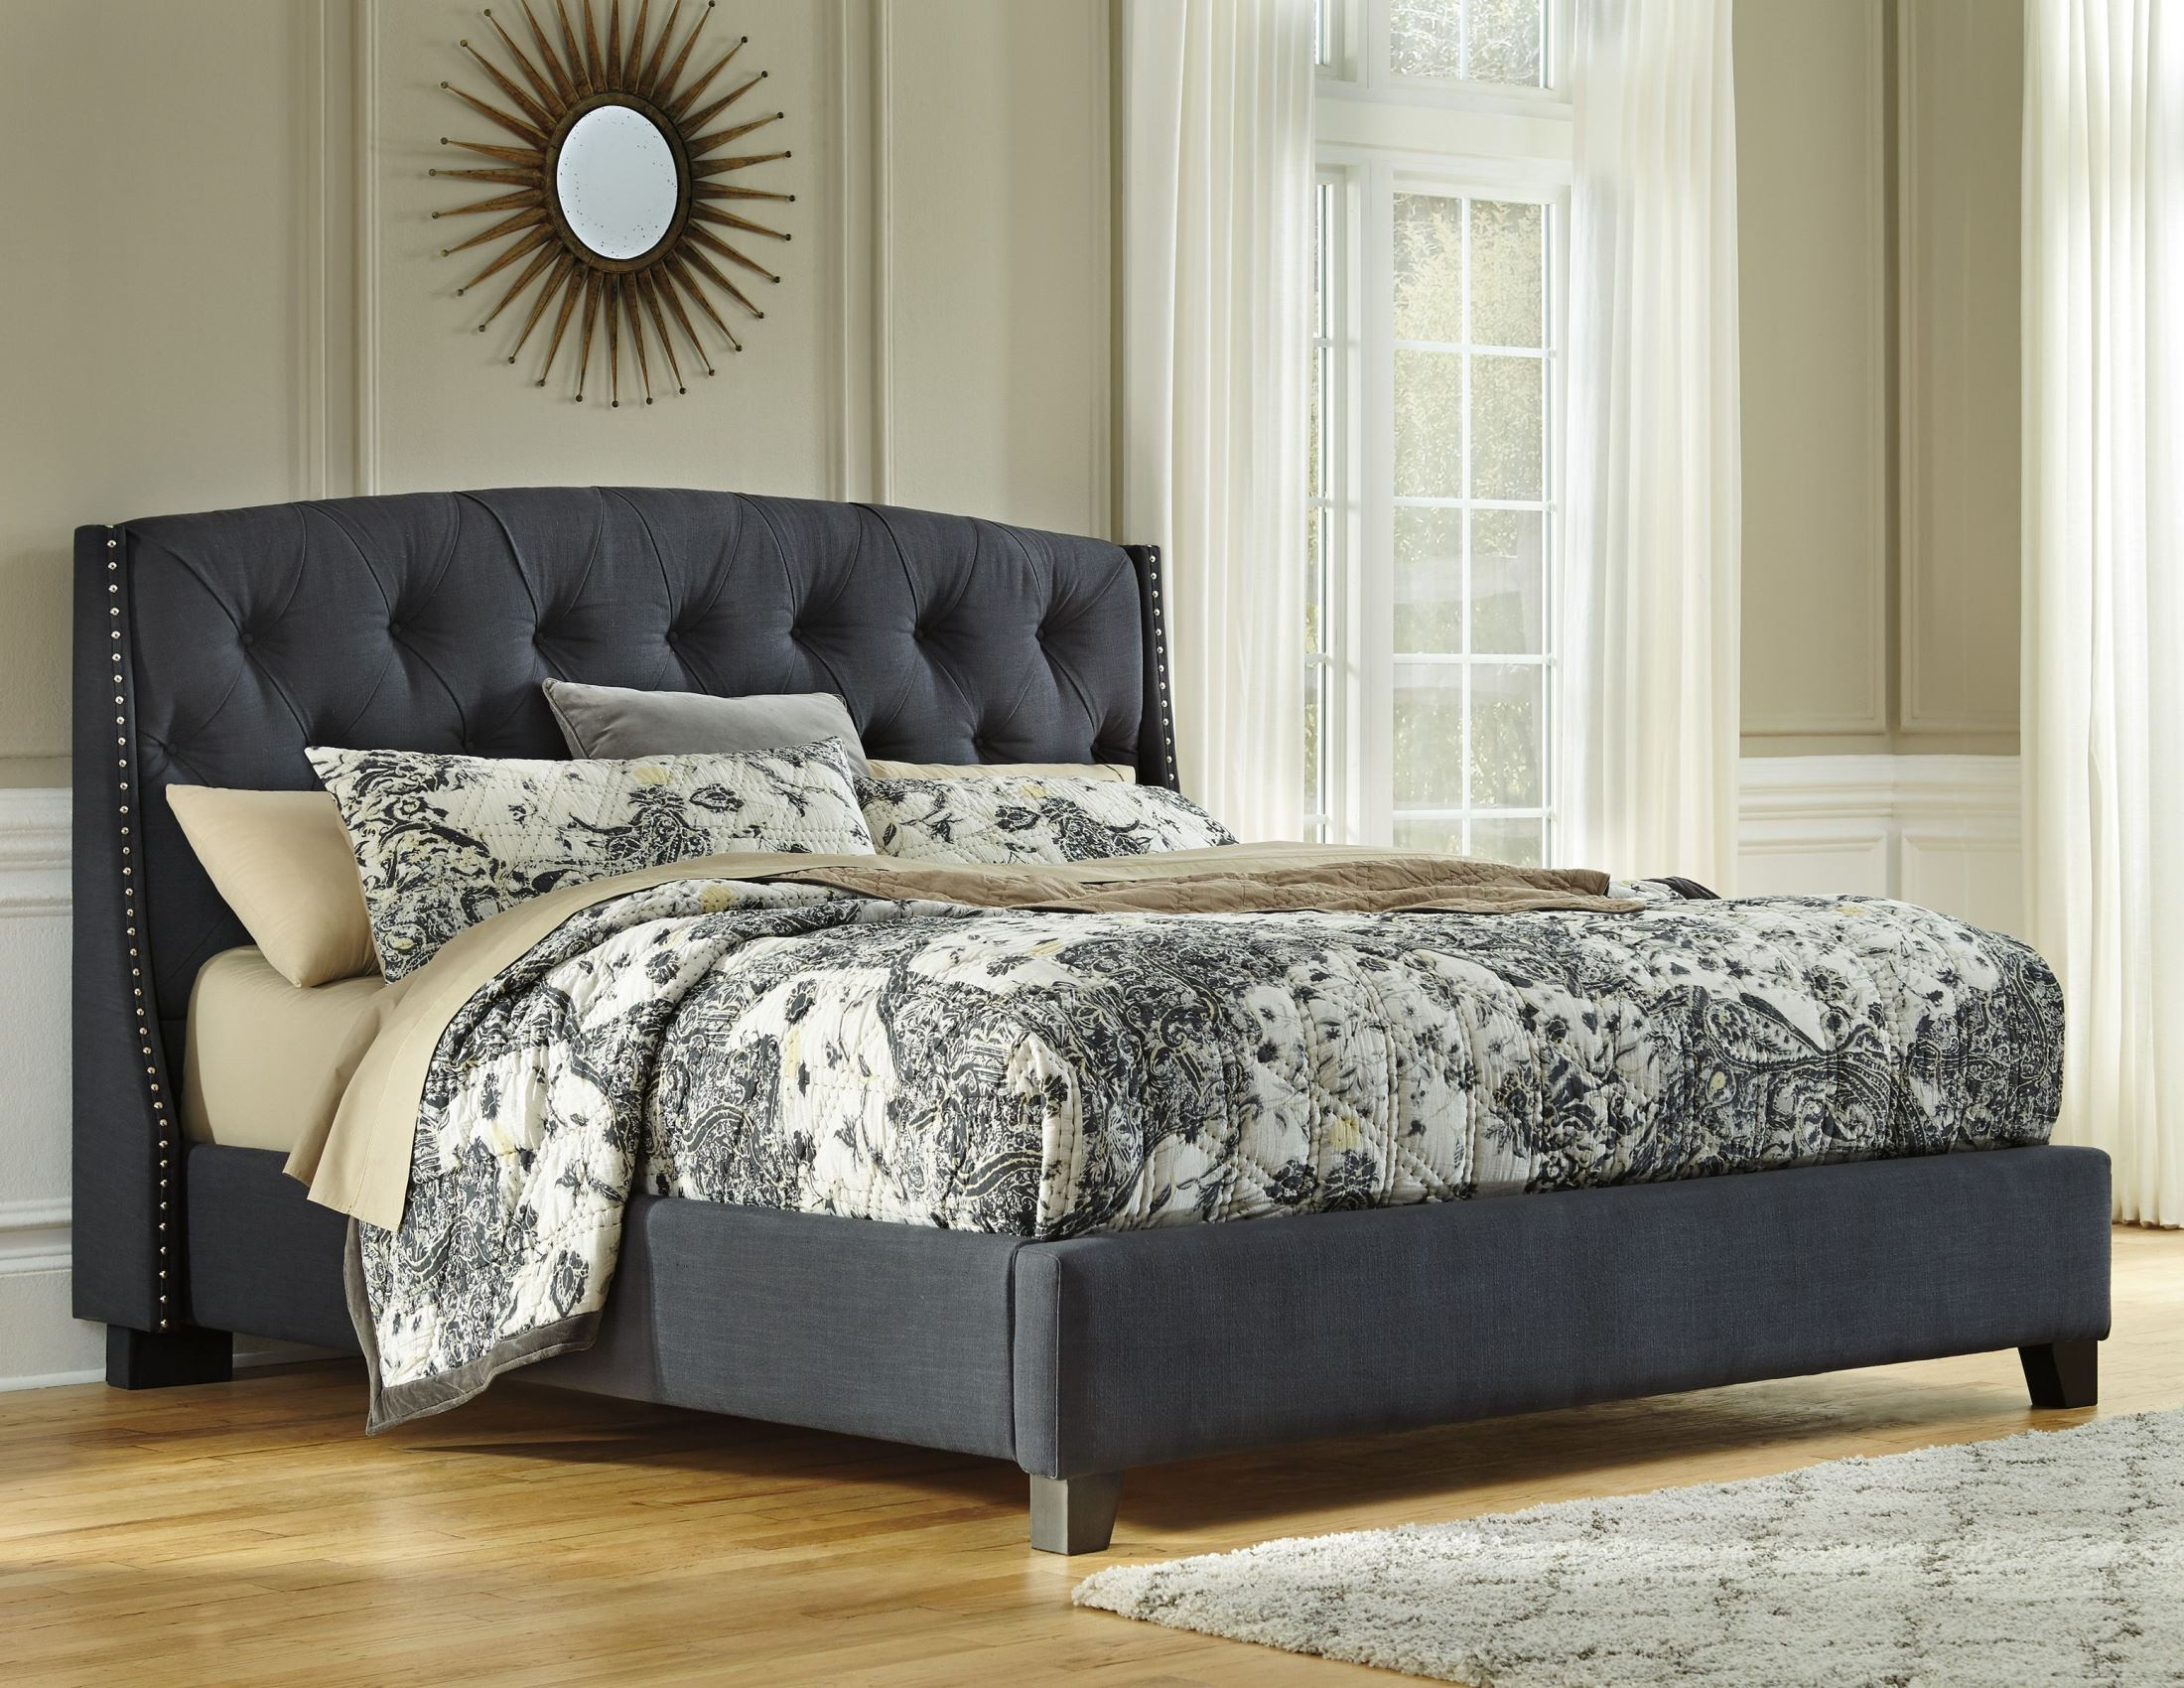 Cal King Upholstered Platform Bed From Ashley B600 558